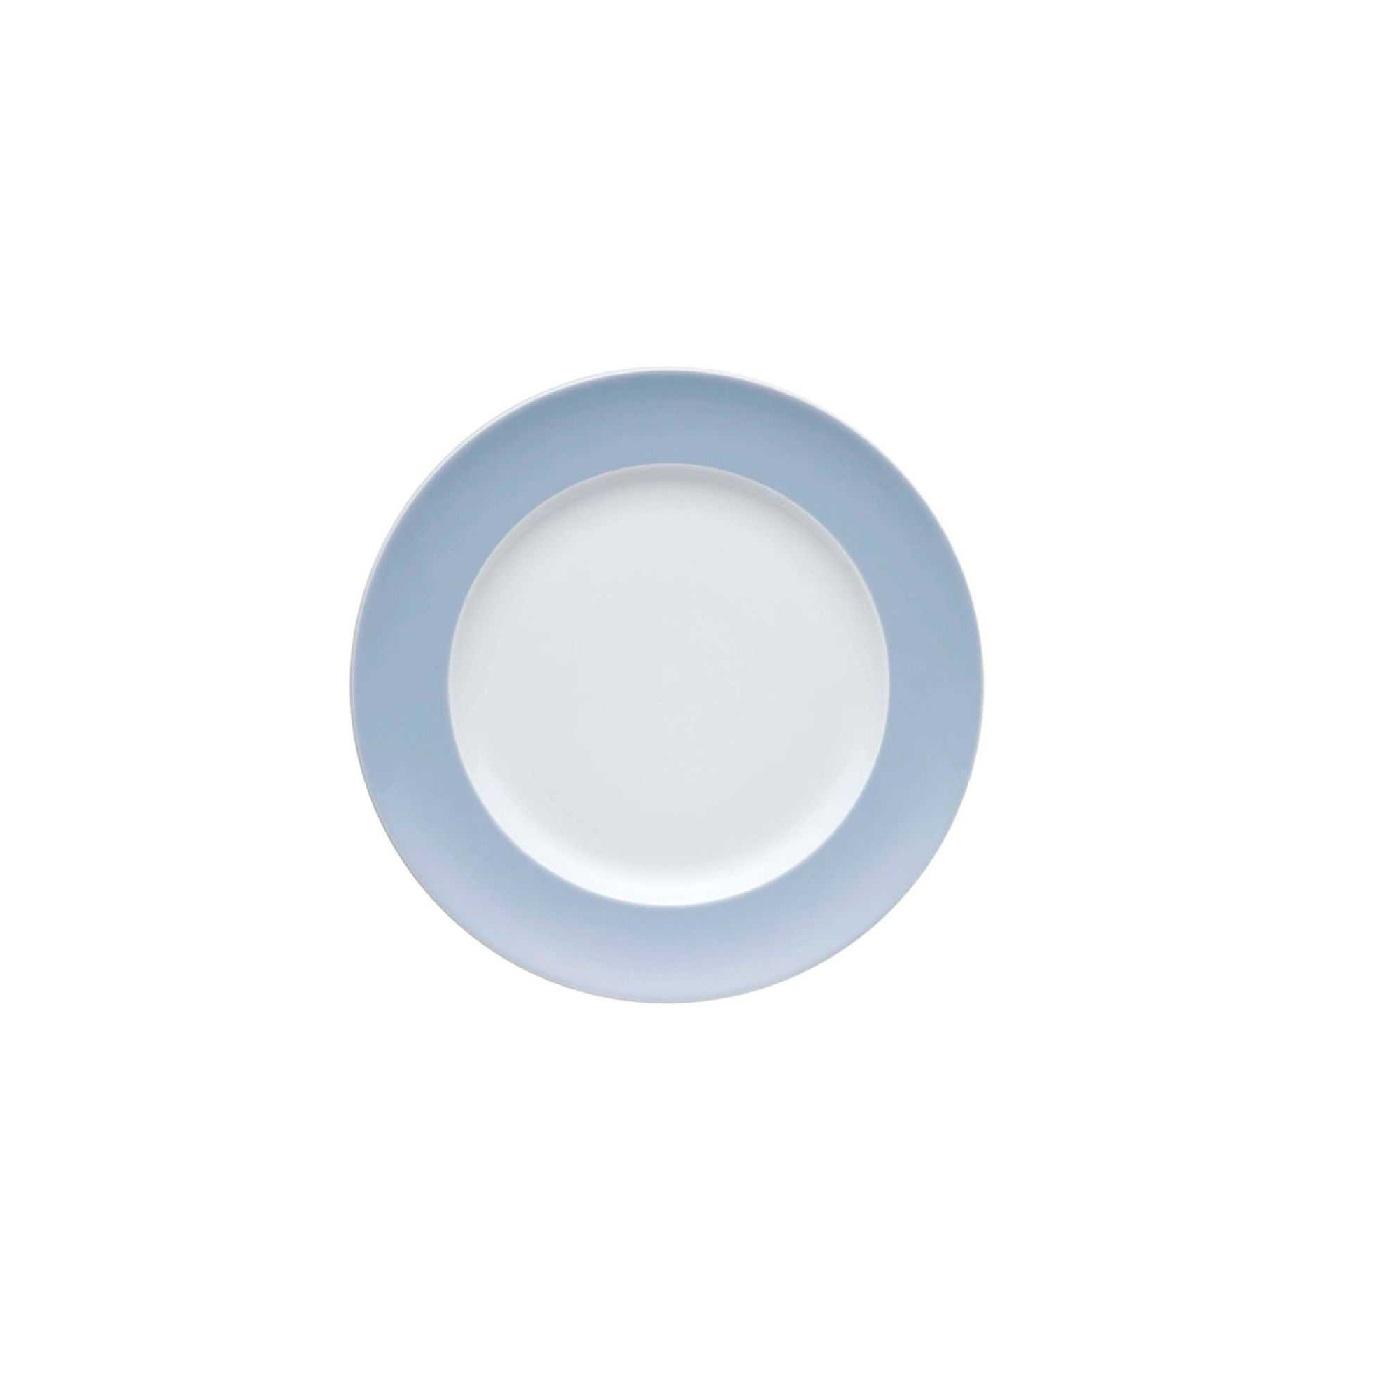 Тарелка десертная/закусочная Rosenthal SUNNY DAY, диаметр 22 см, голубой Rosenthal 70850-408510-10222 фото 1